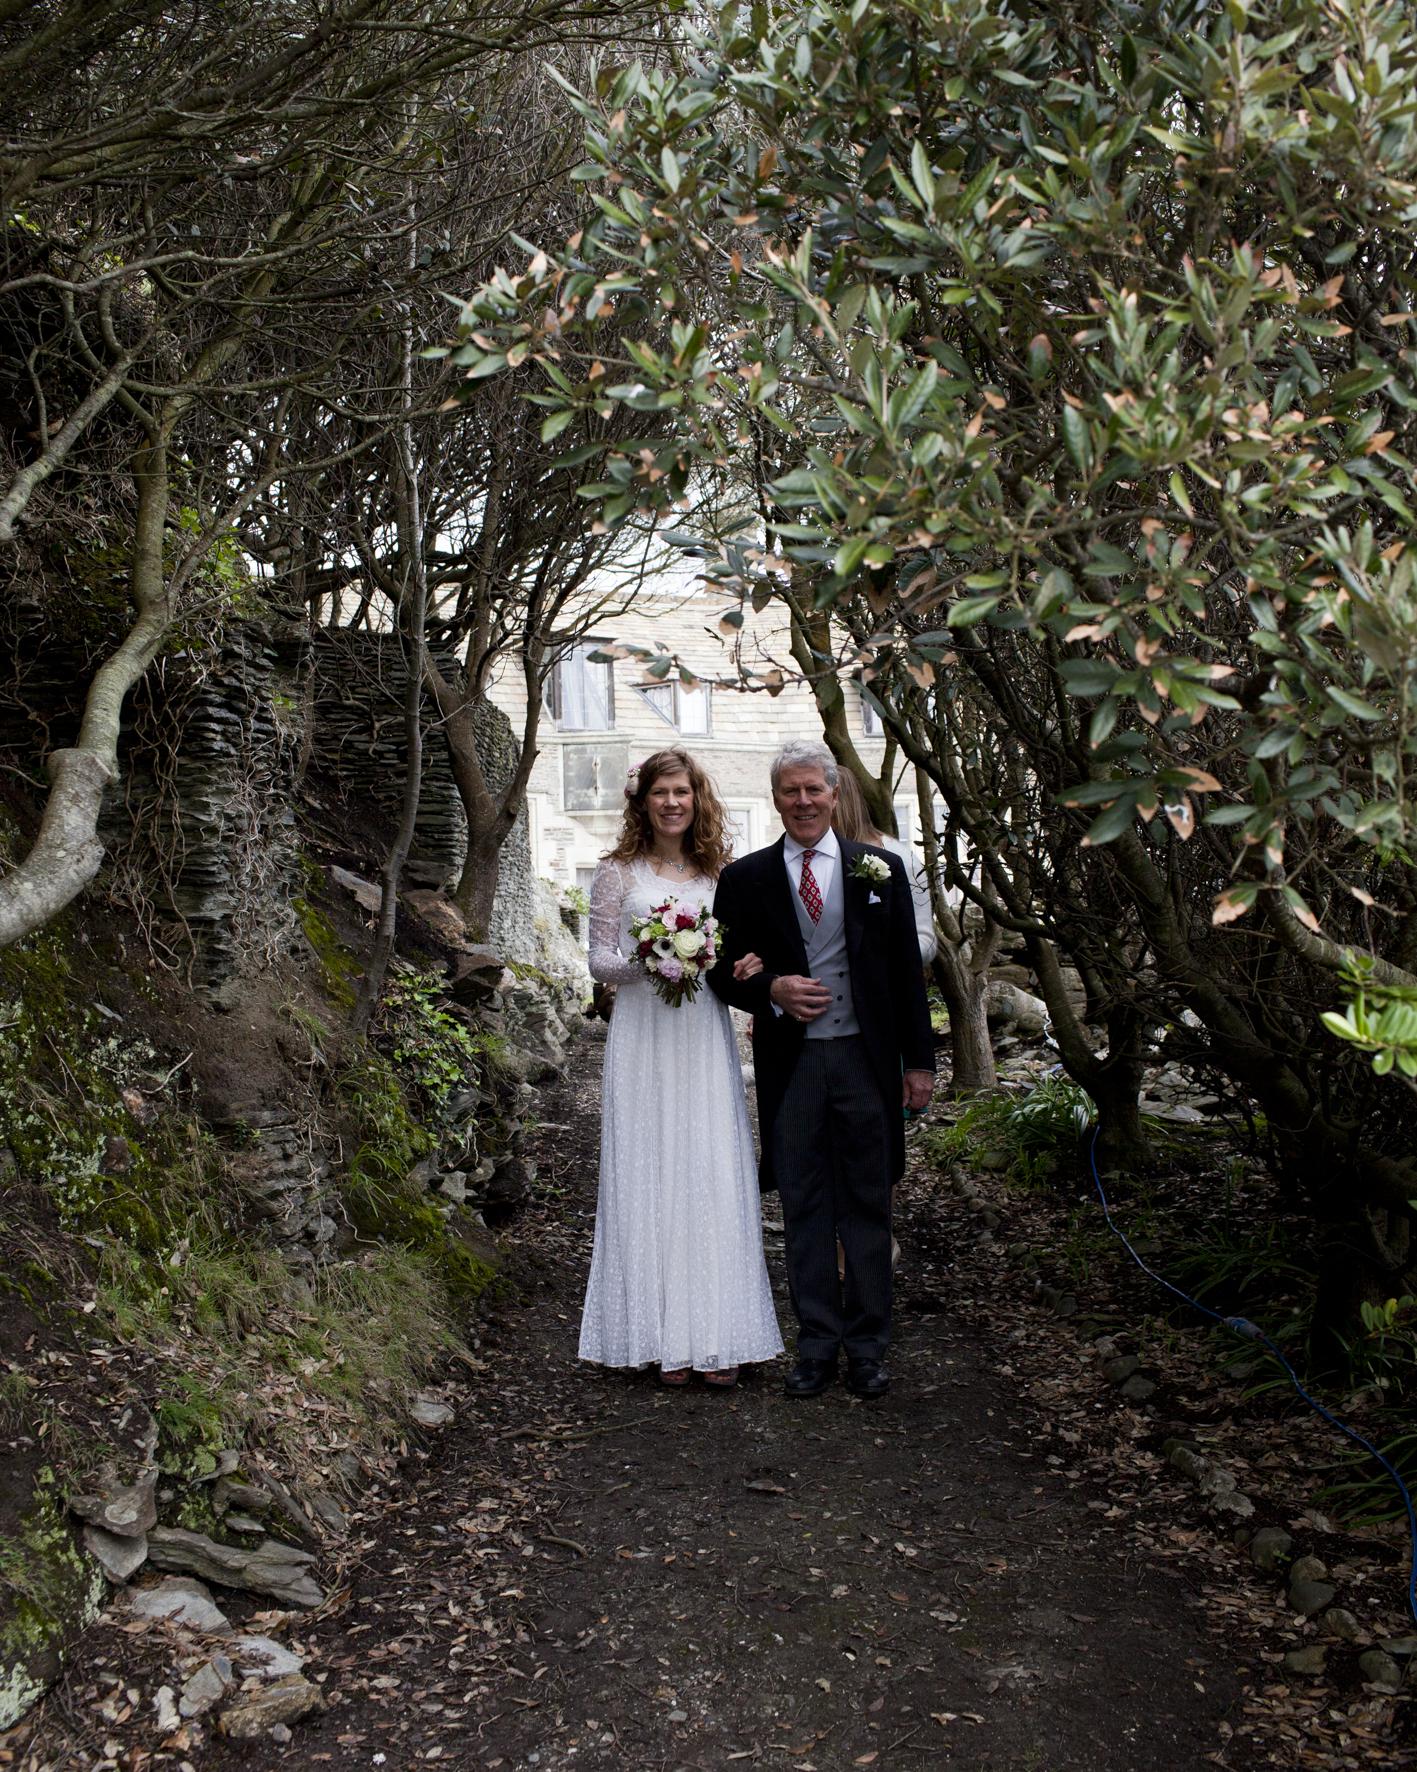 Wedding example_M&P__MG_3299_Claudia Leisinger.jpg